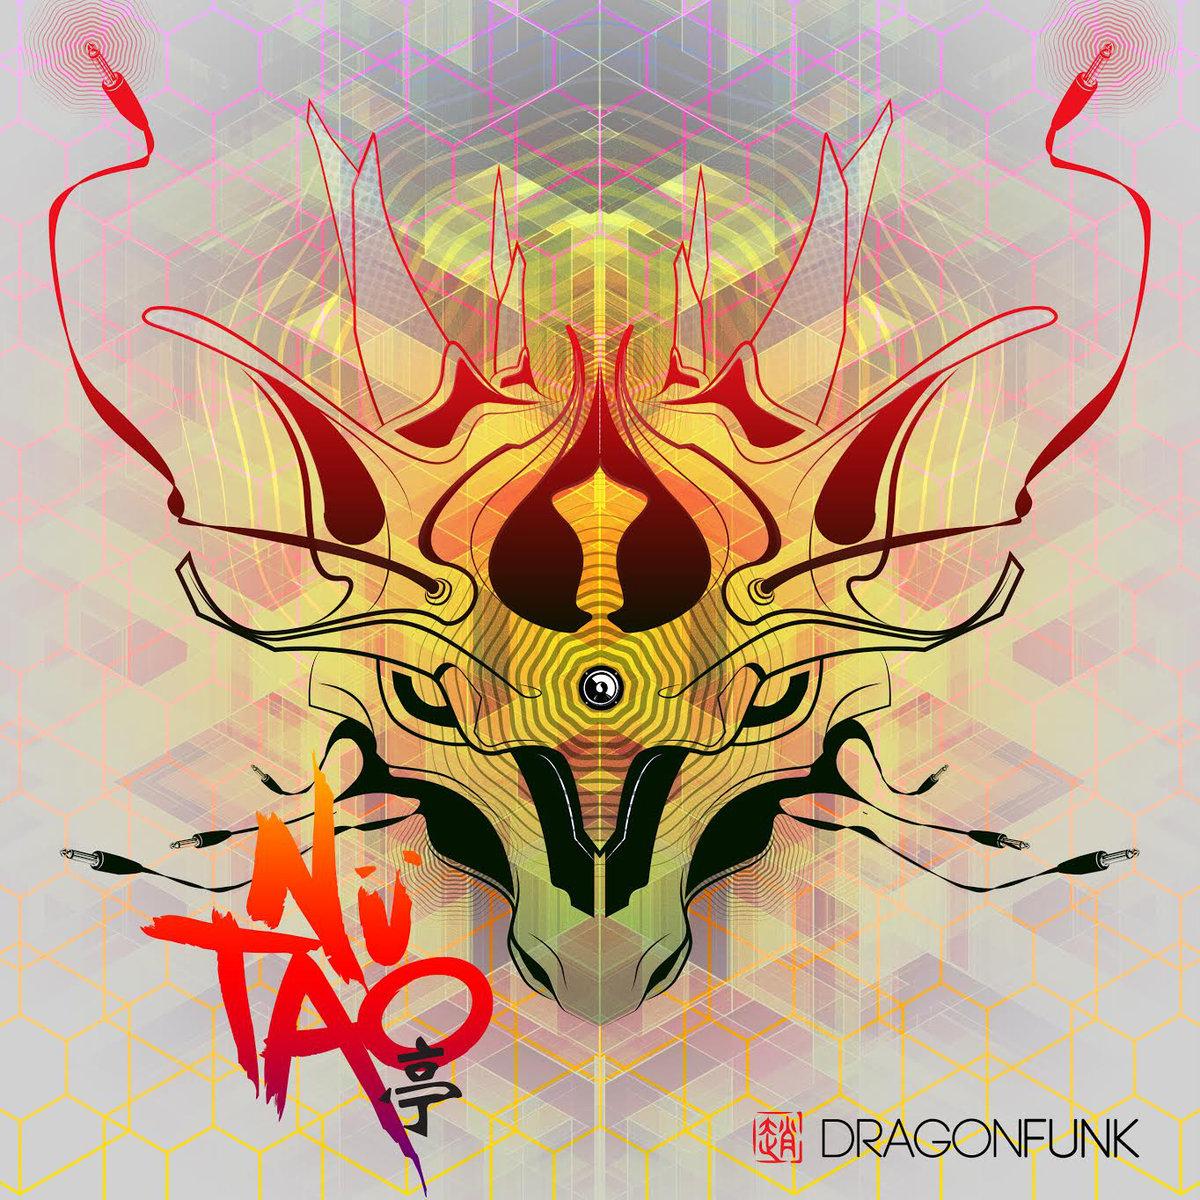 nü tao - Dragonfunk